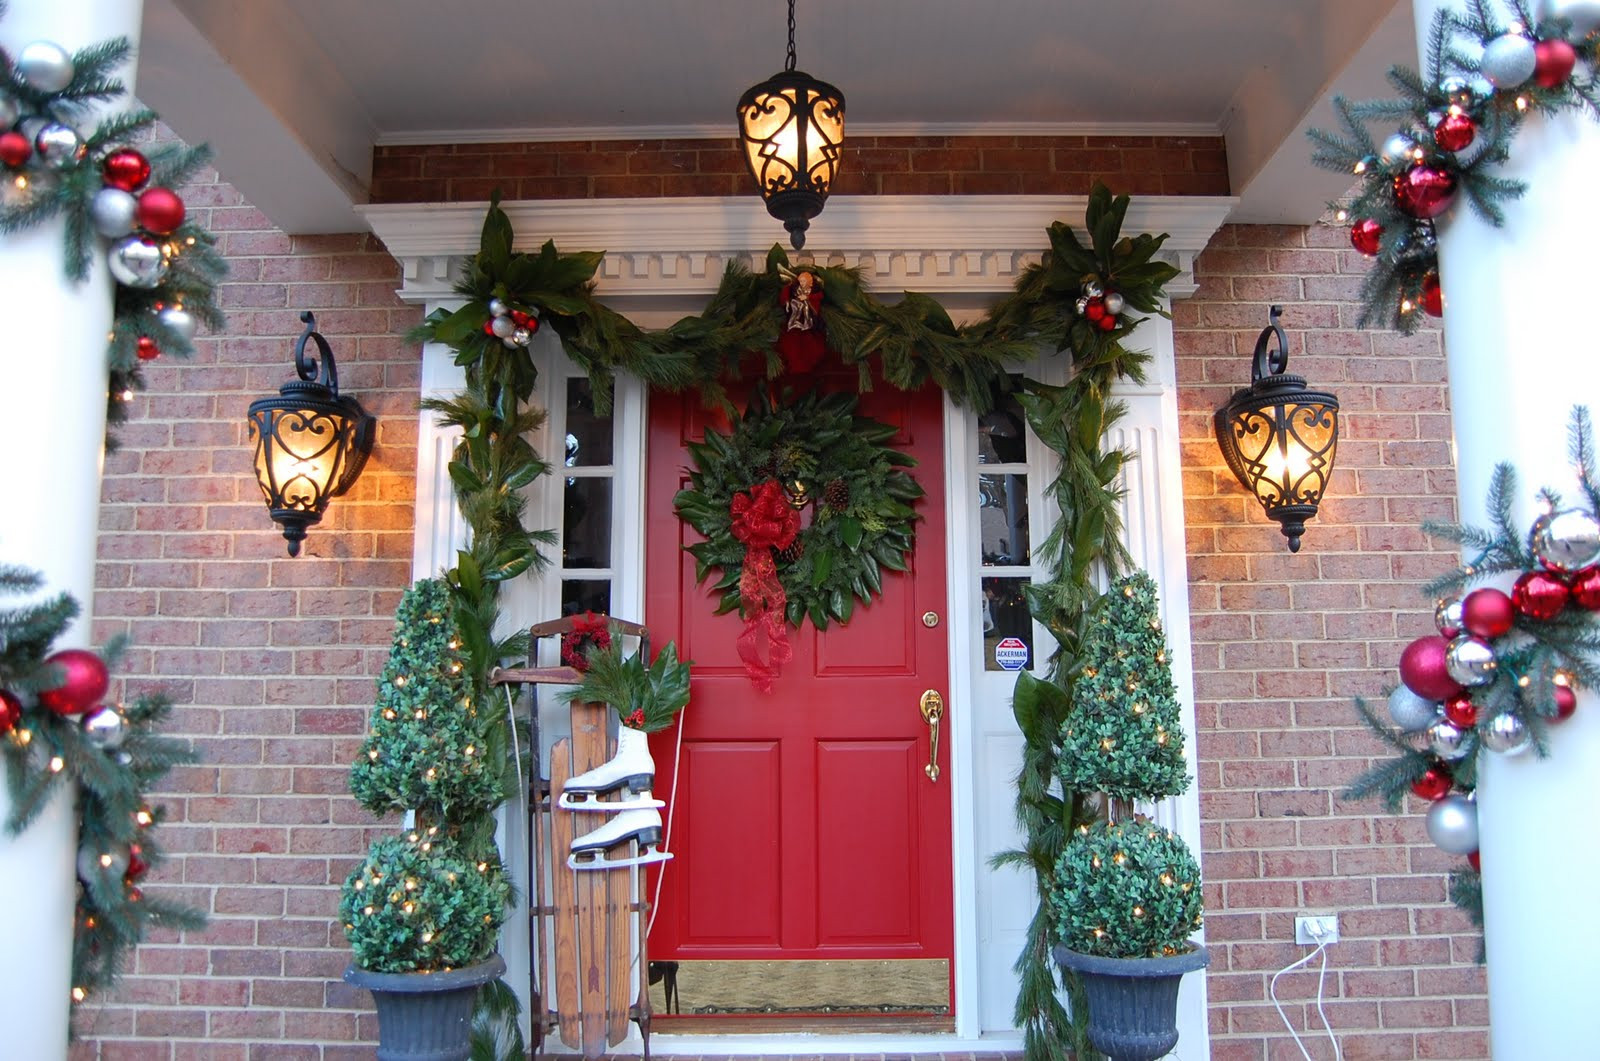 Best ideas about Outdoor Christmas Garland . Save or Pin 50 Best Outdoor Christmas Decorations for 2016 Now.